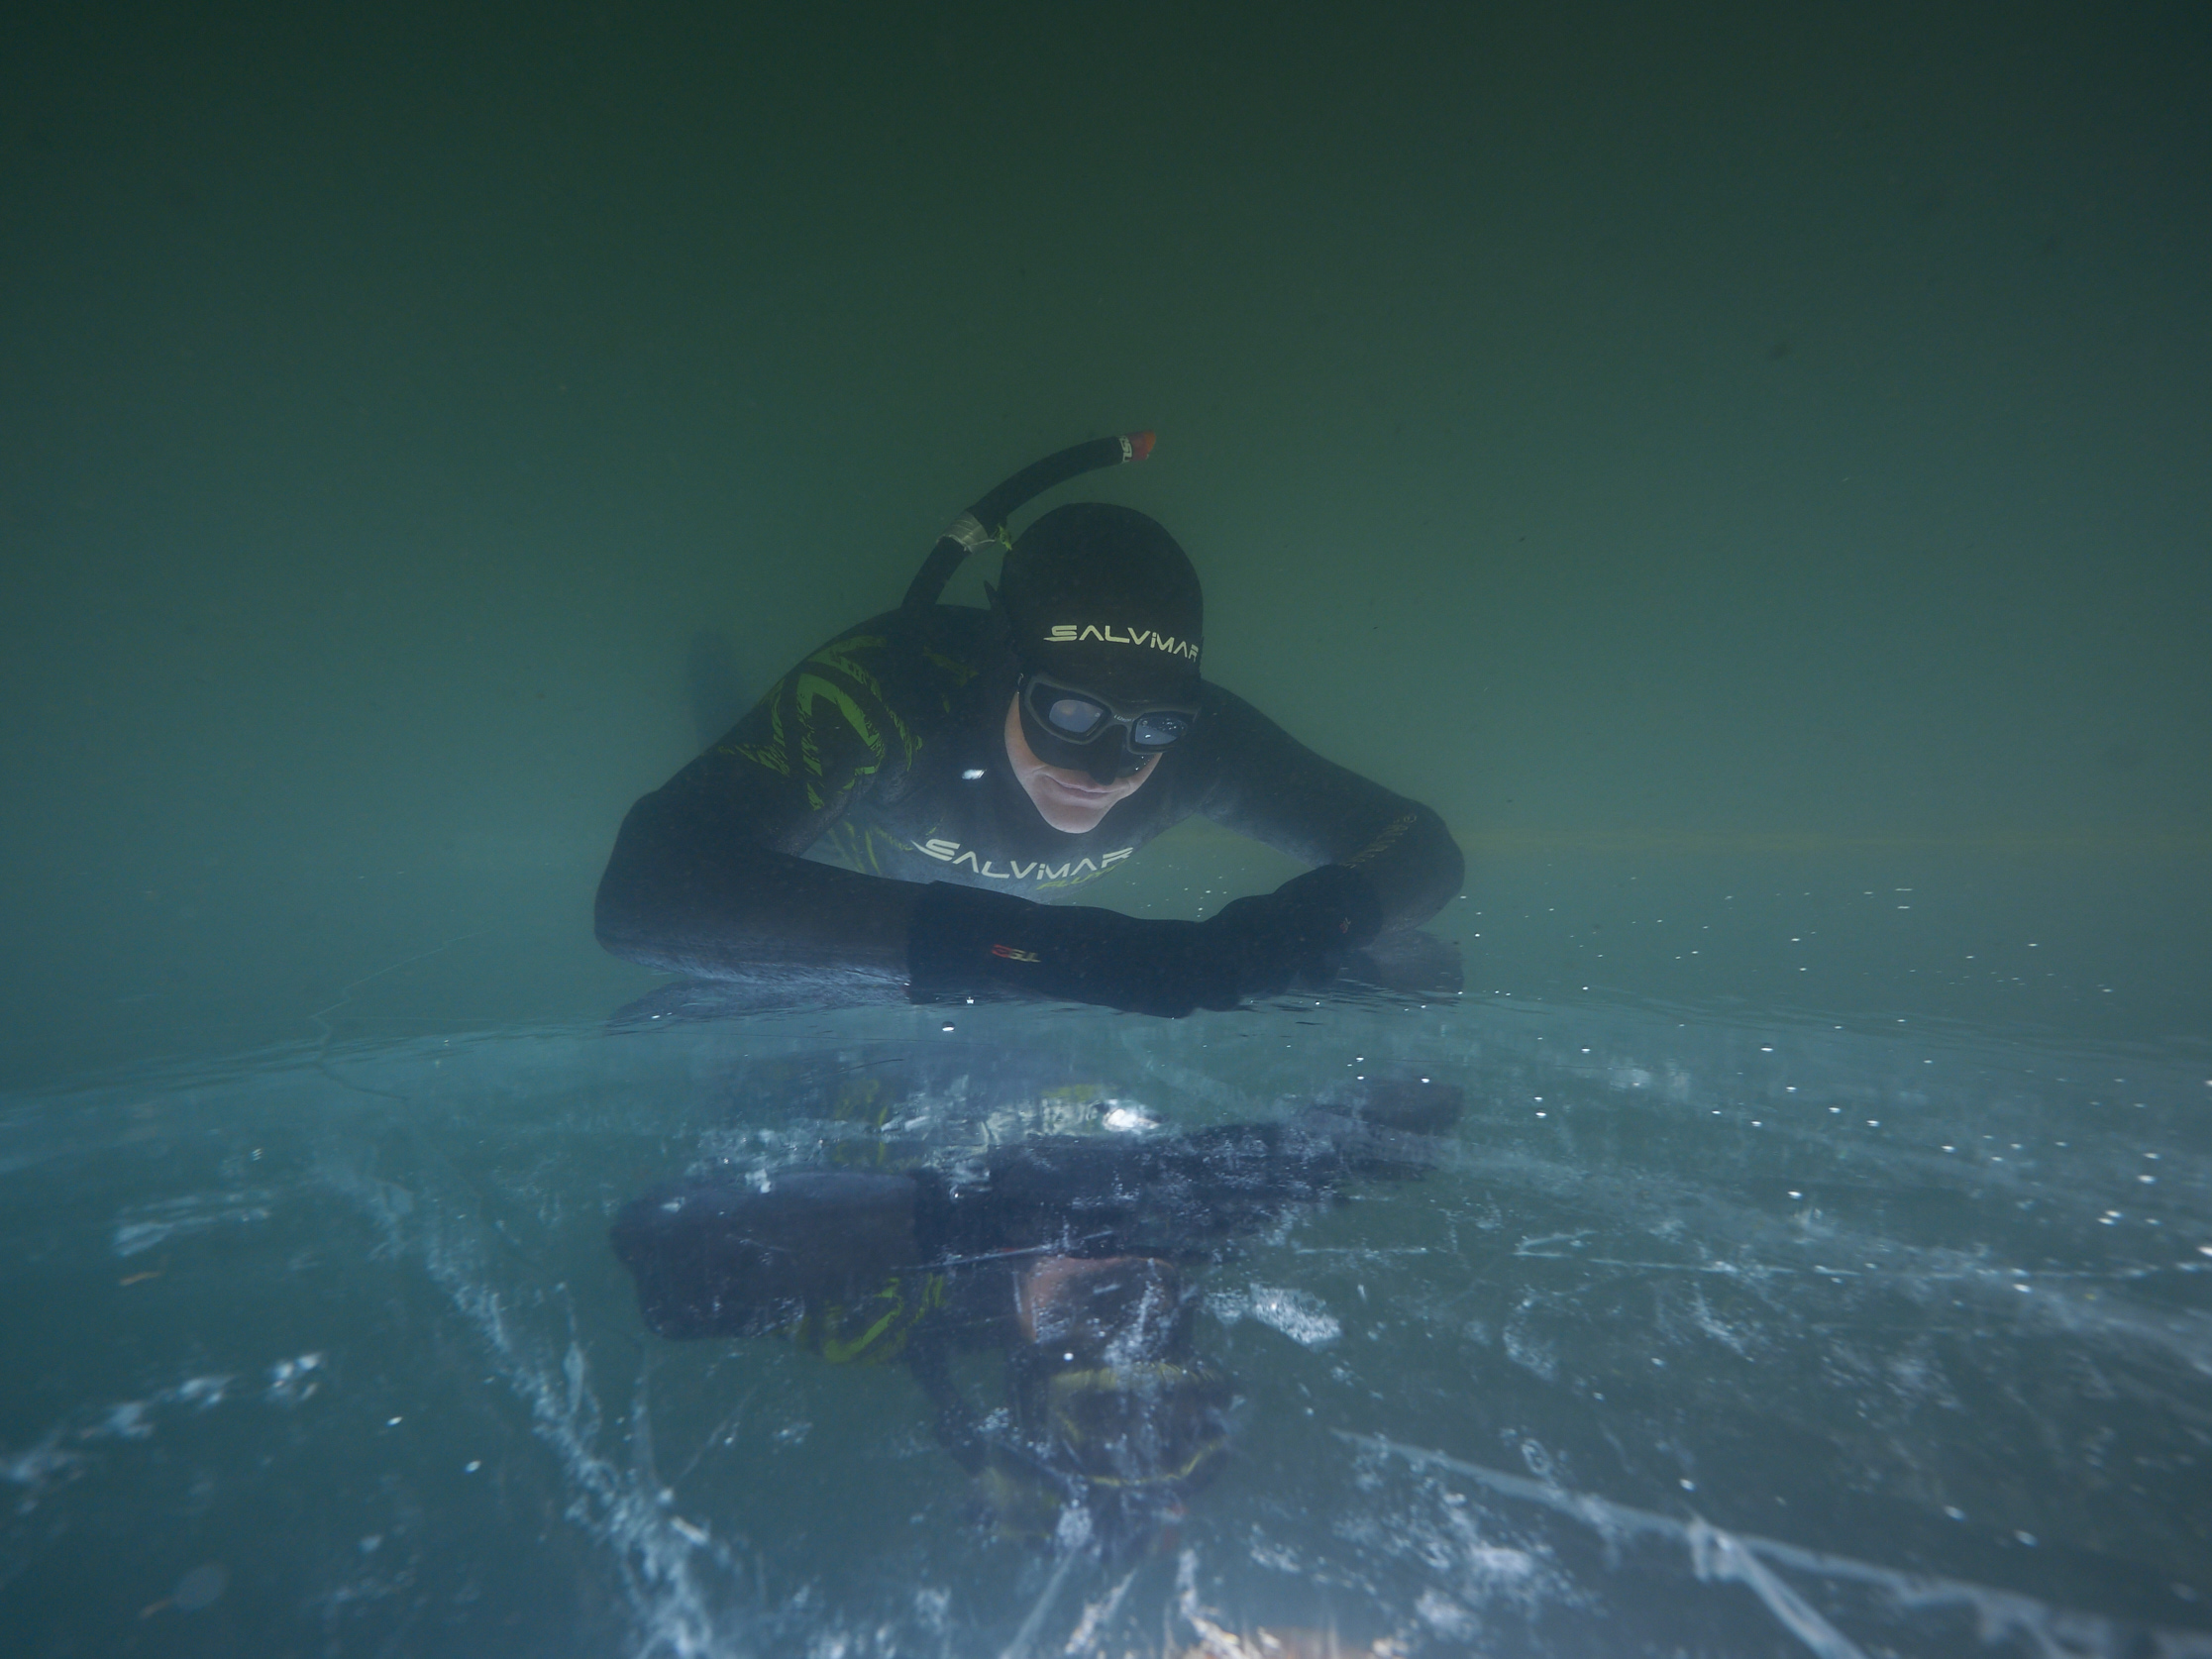 Ice freediving Barbora 2019